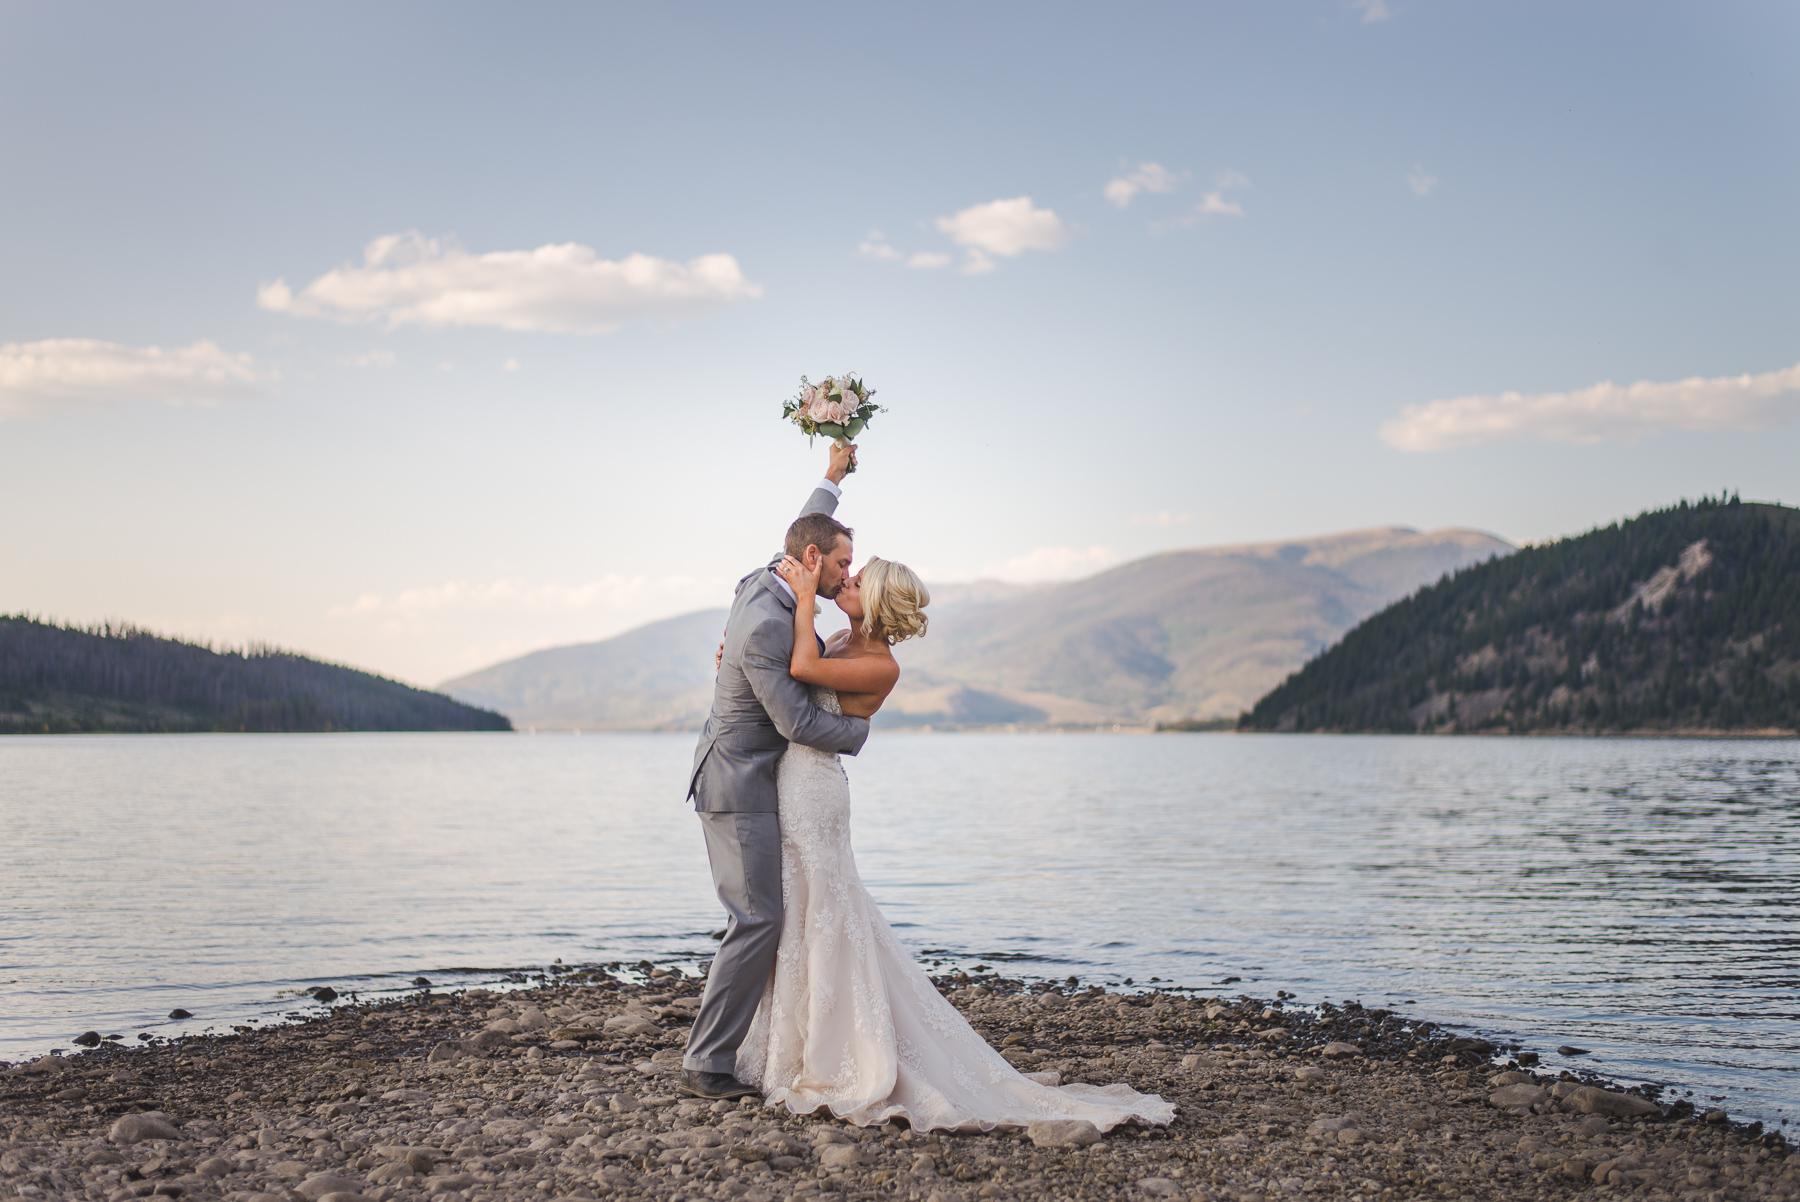 labor day weekend wedding near lake dillon and breckenridge, colorado | keeping composure photography + summit mountain weddings